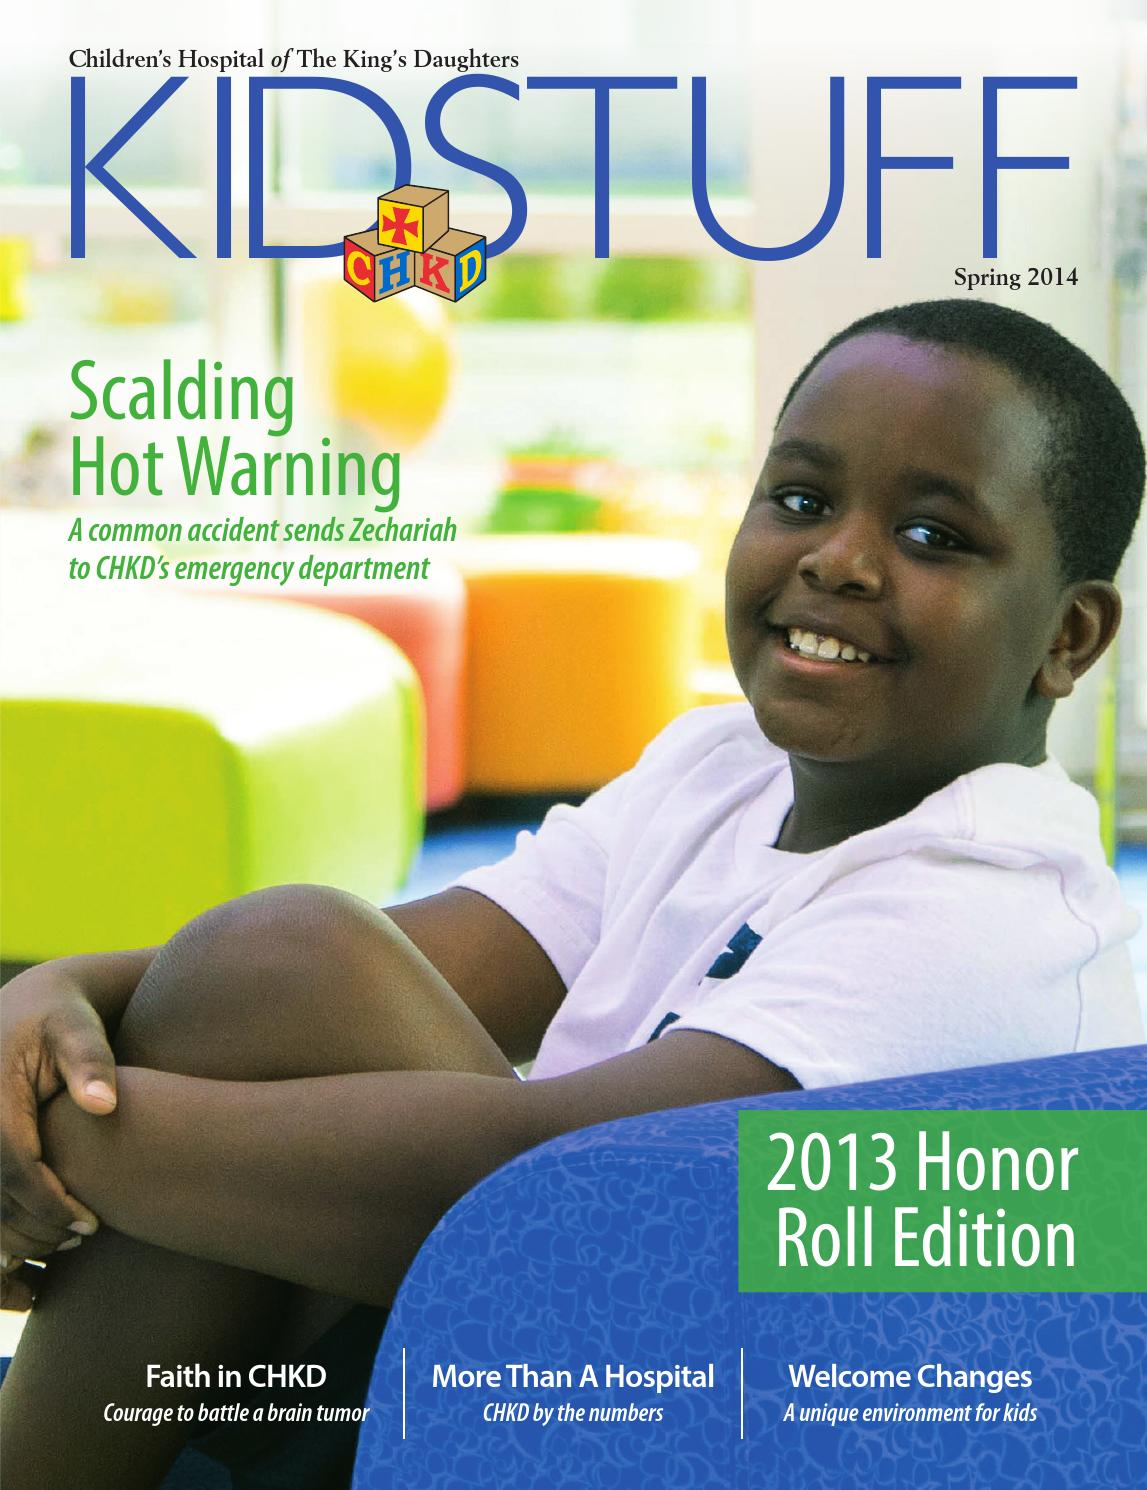 Chkd Kidstuff Spring 2014 By Children S Hospital Of The